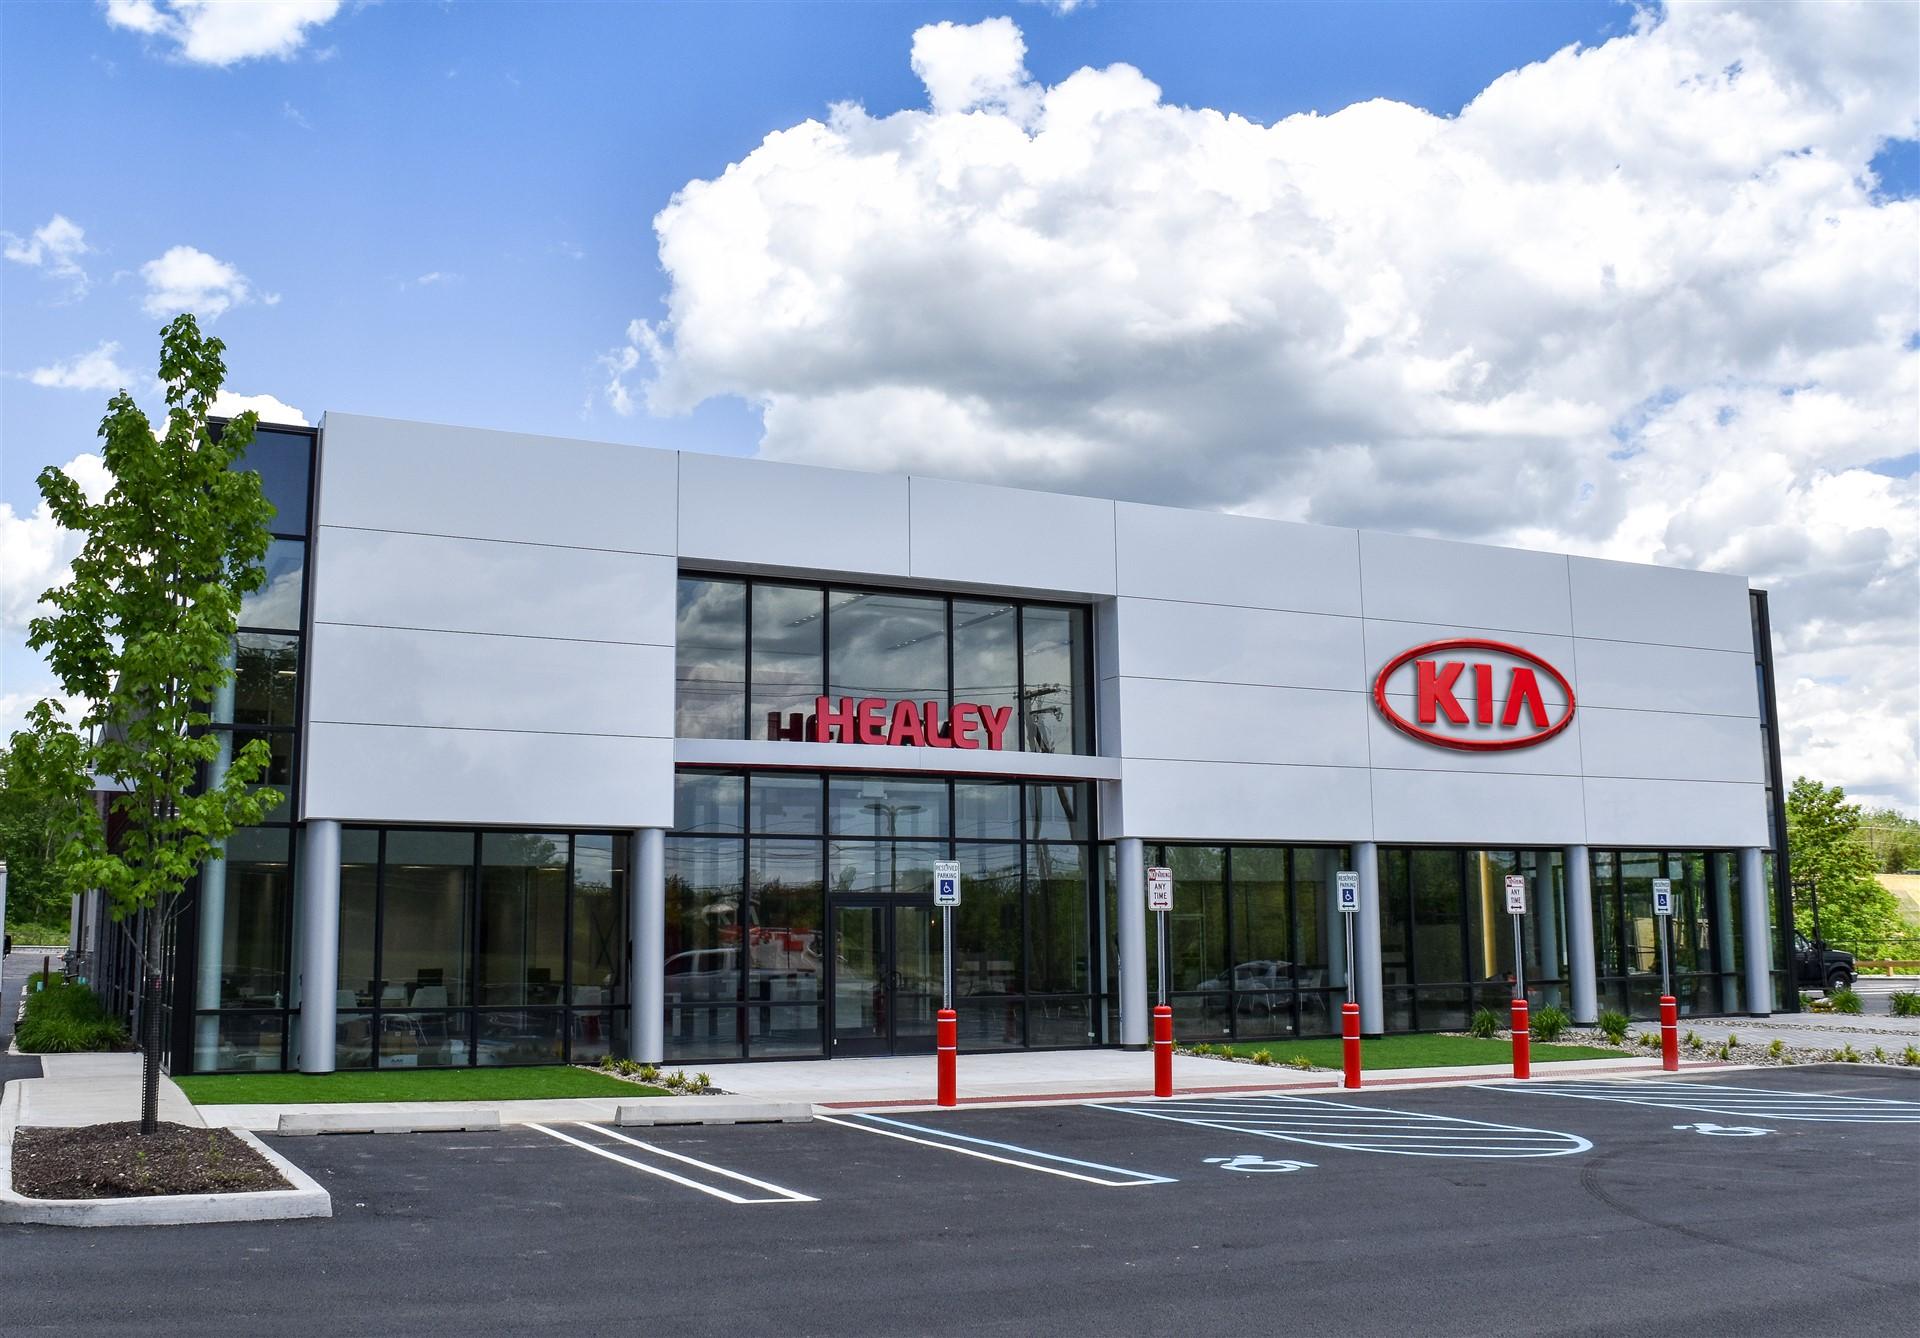 Healey Kia 114 Route 17K Newburgh NY Auto Dealers MapQuest